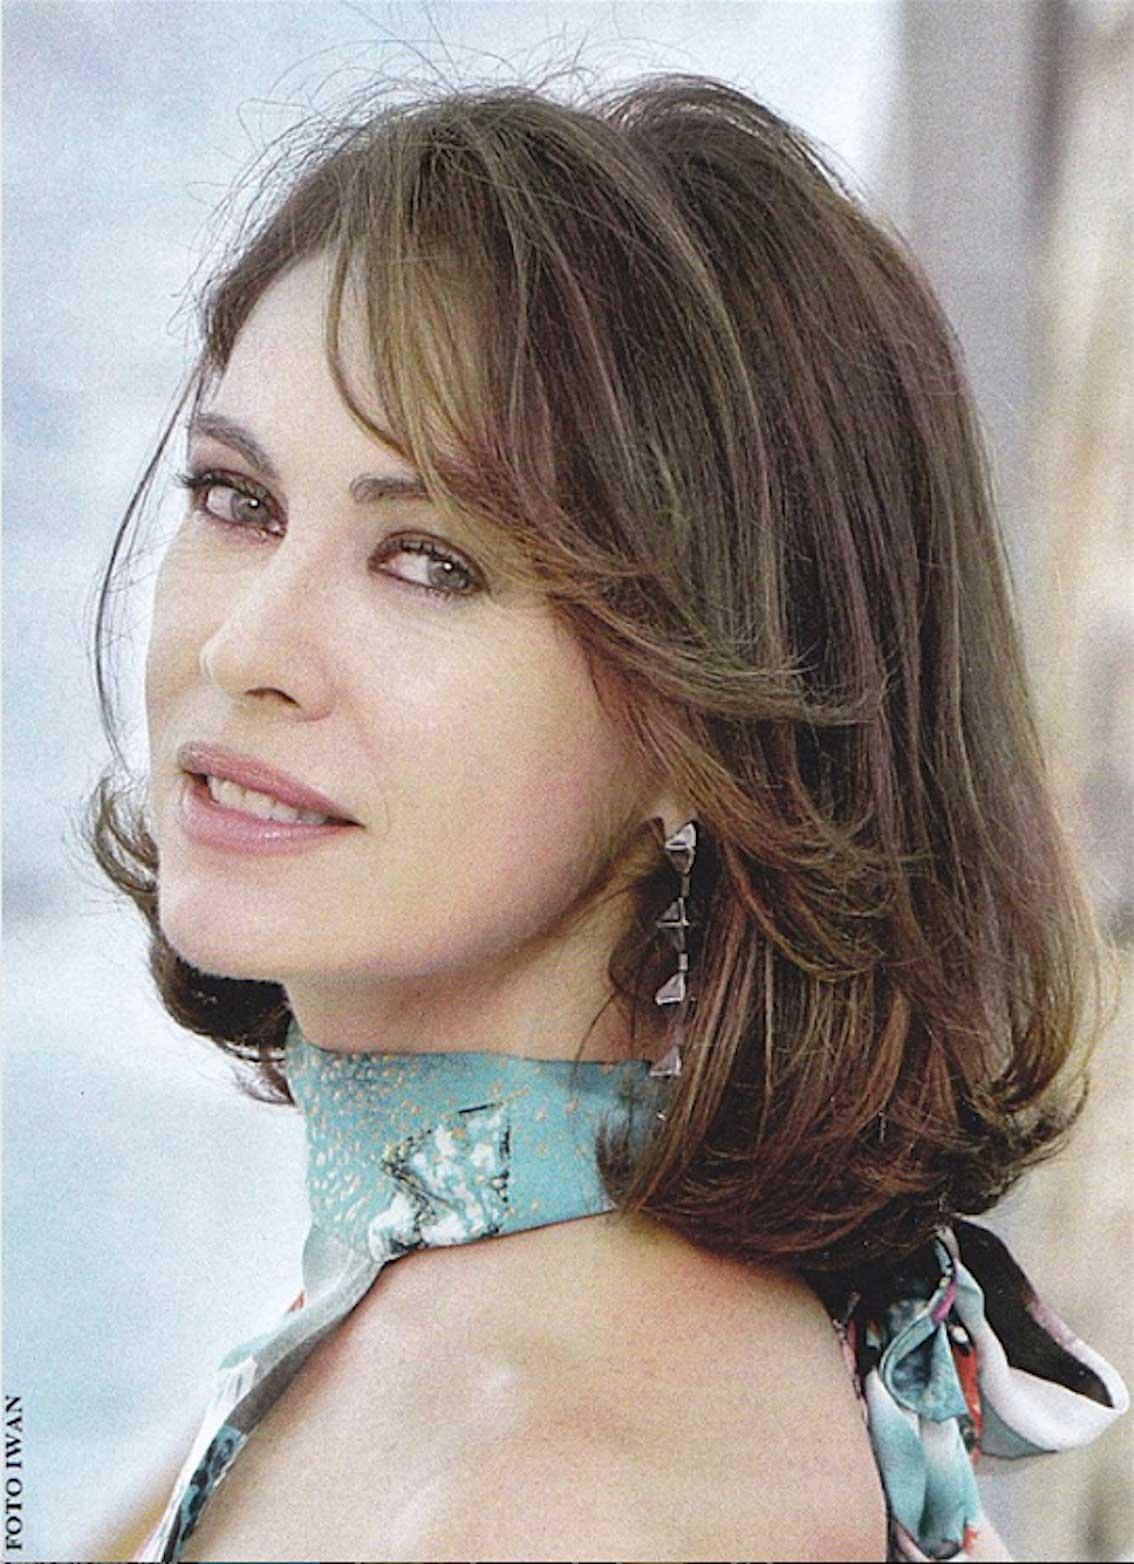 https://www.elenasofiaricci.com/wp-content/uploads/2018/07/elena-sofia-ricci-foto-iwan.jpg